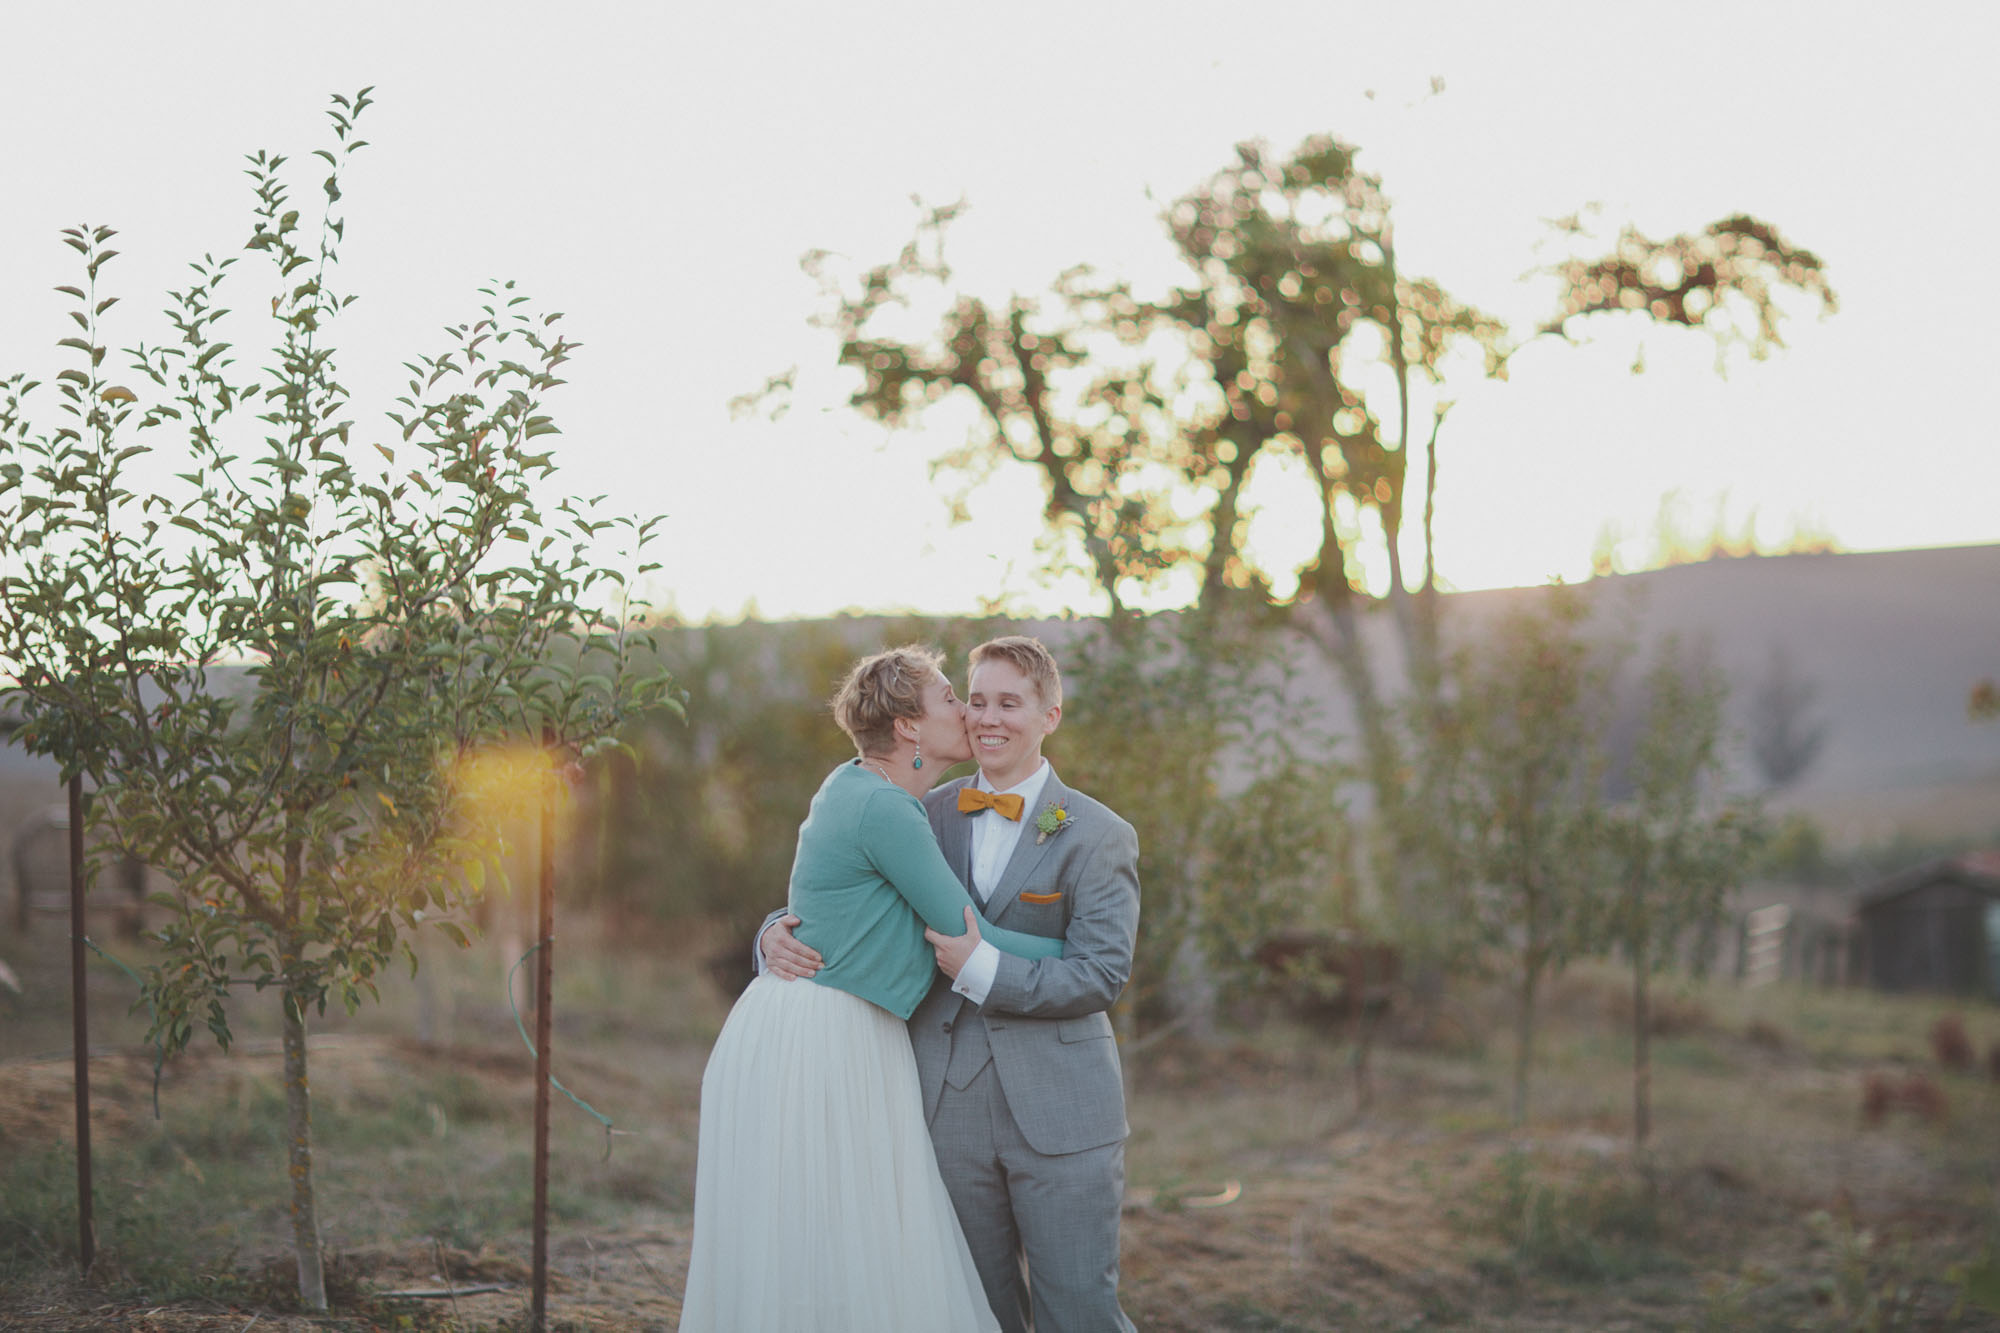 Gretchen_Gause_Petaluma_Olympias_Valley_Wedding_Photo-205.jpg